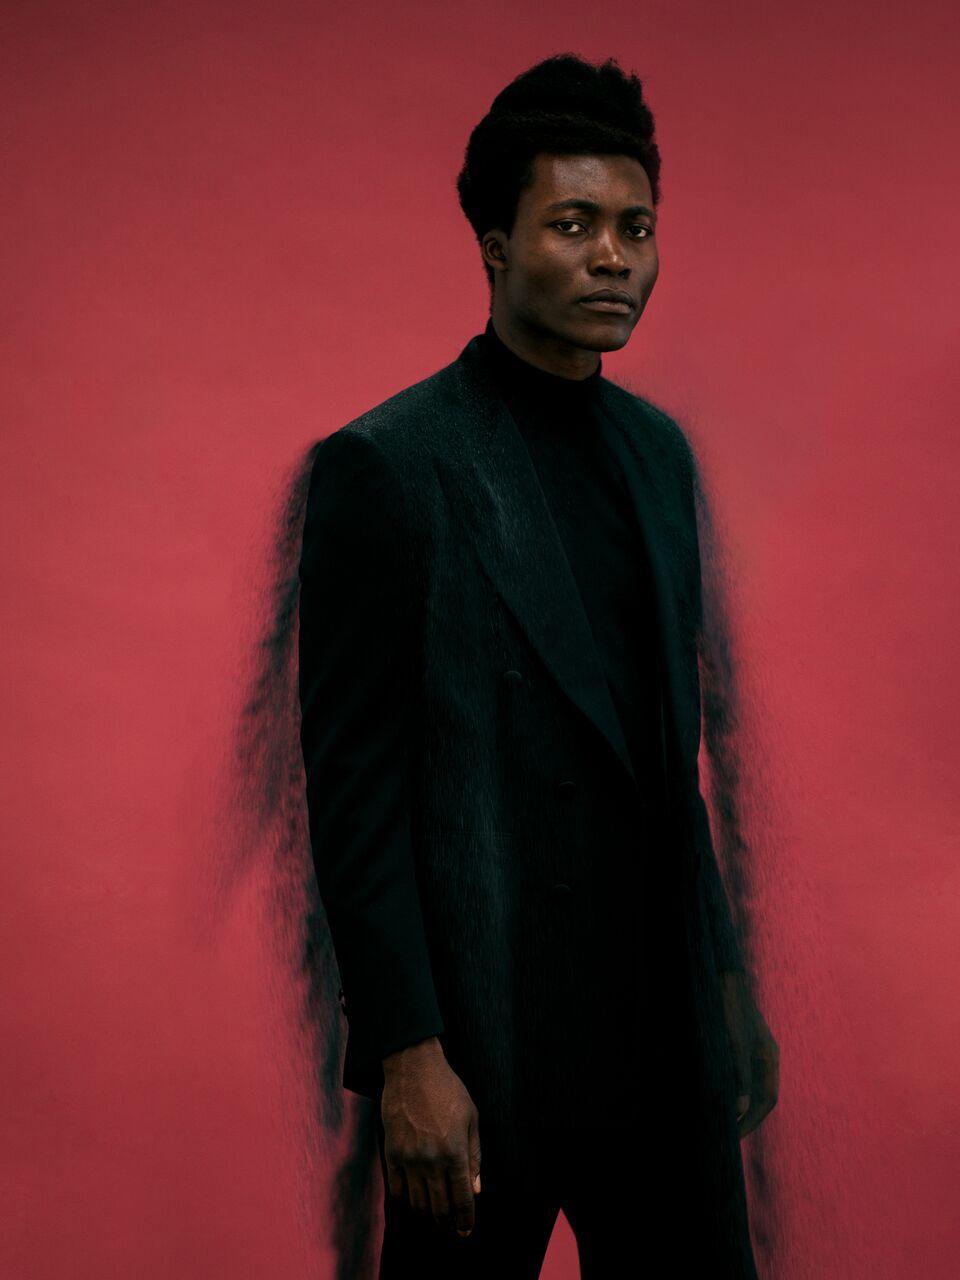 Benjamin Clementine for Wonderland Magazine. Outtake by David Uzochukwu